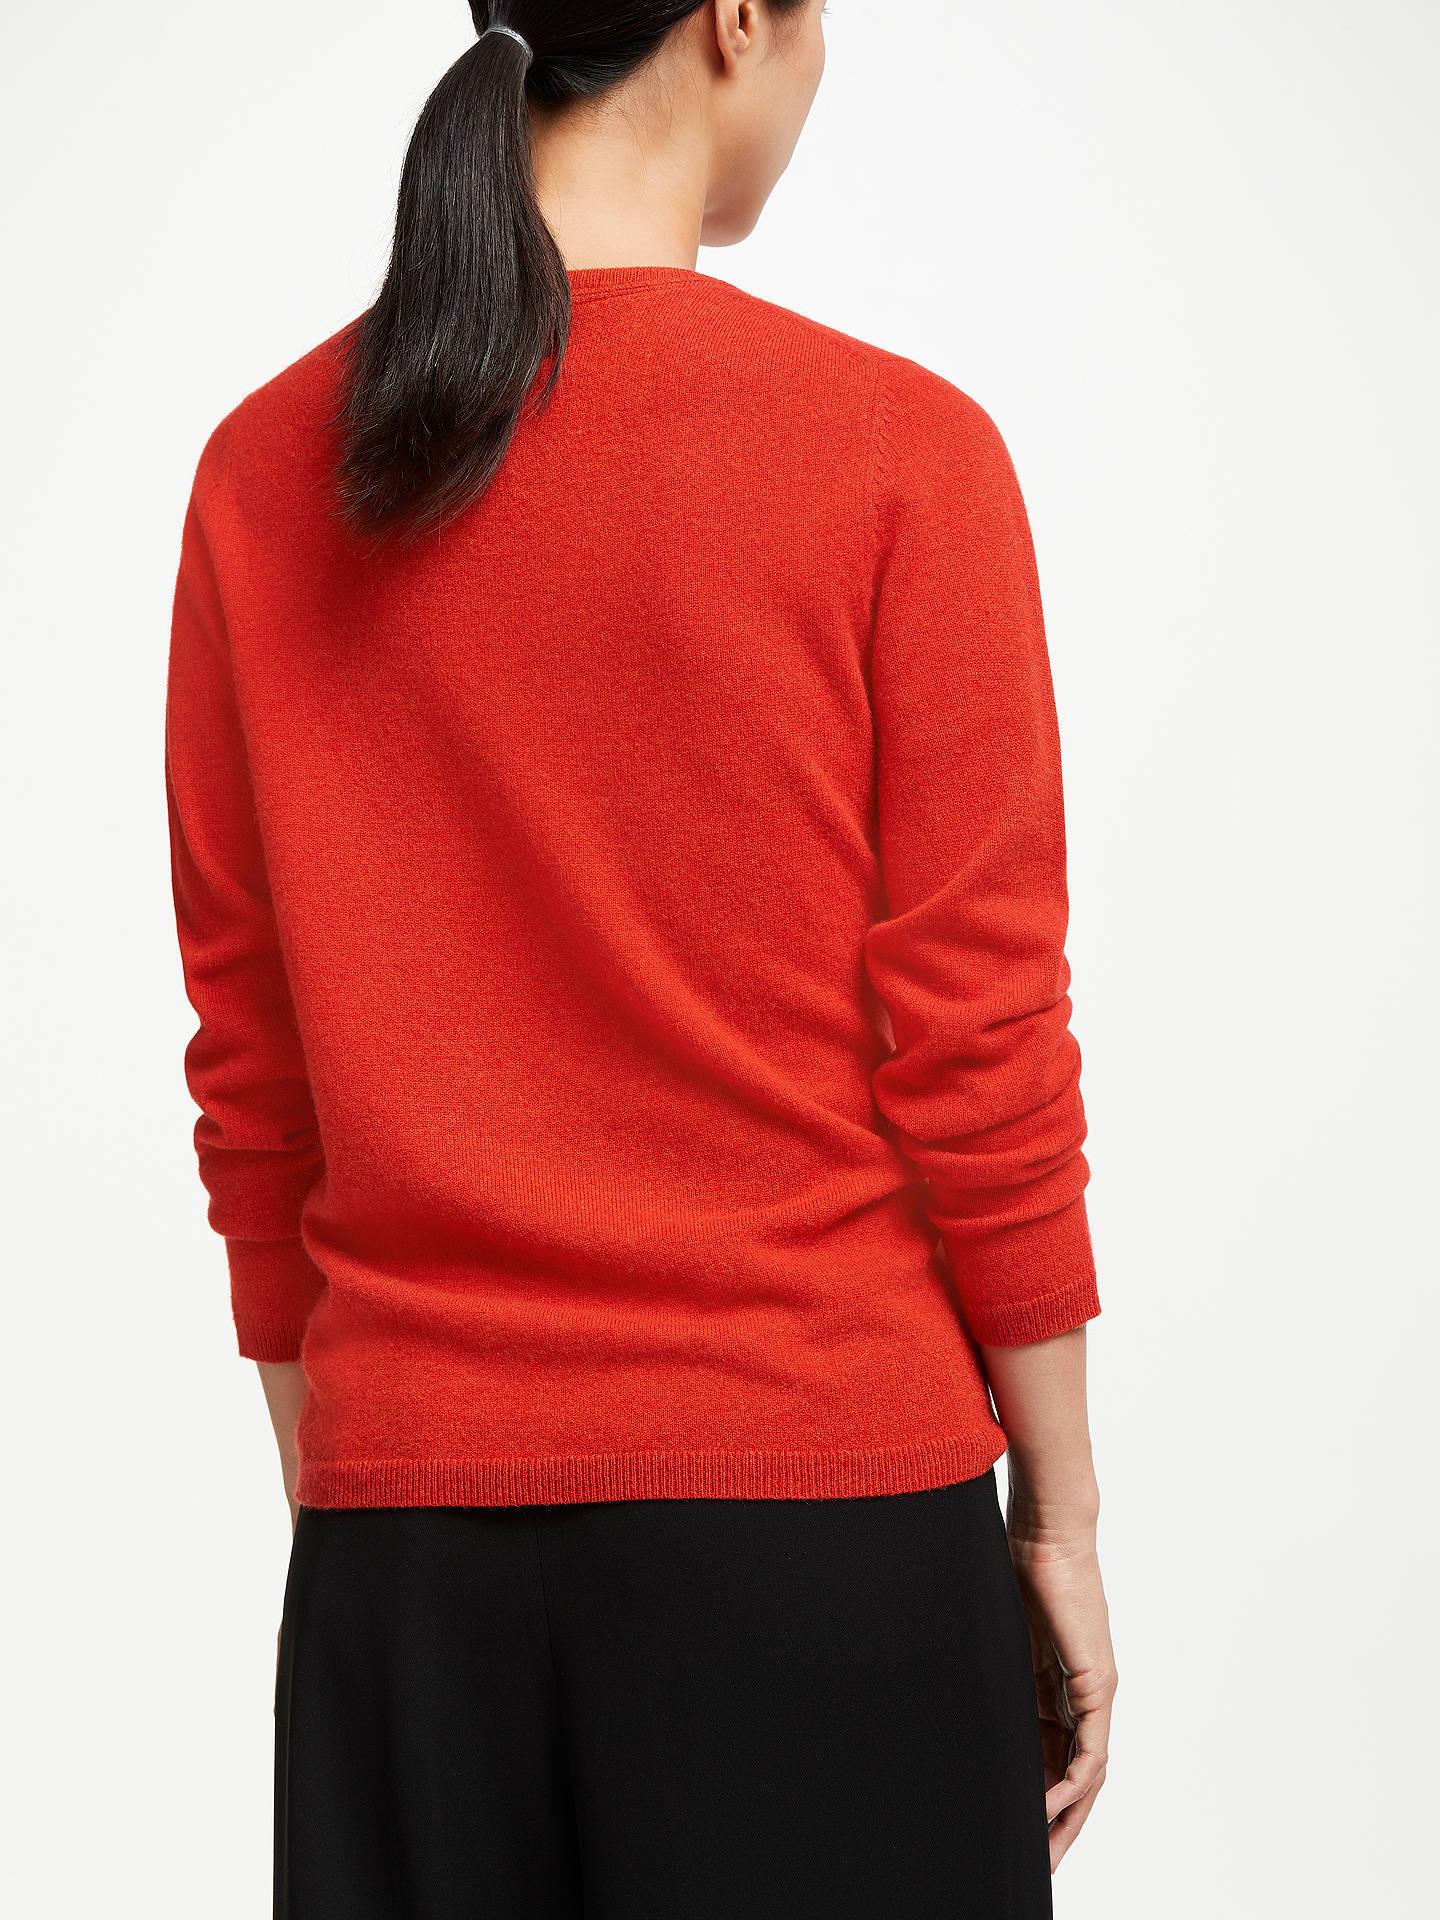 883c3aa3 ... Buy John Lewis & Partners Cashmere Crew Neck Sweater, Burnt Orange, 8  Online at ...